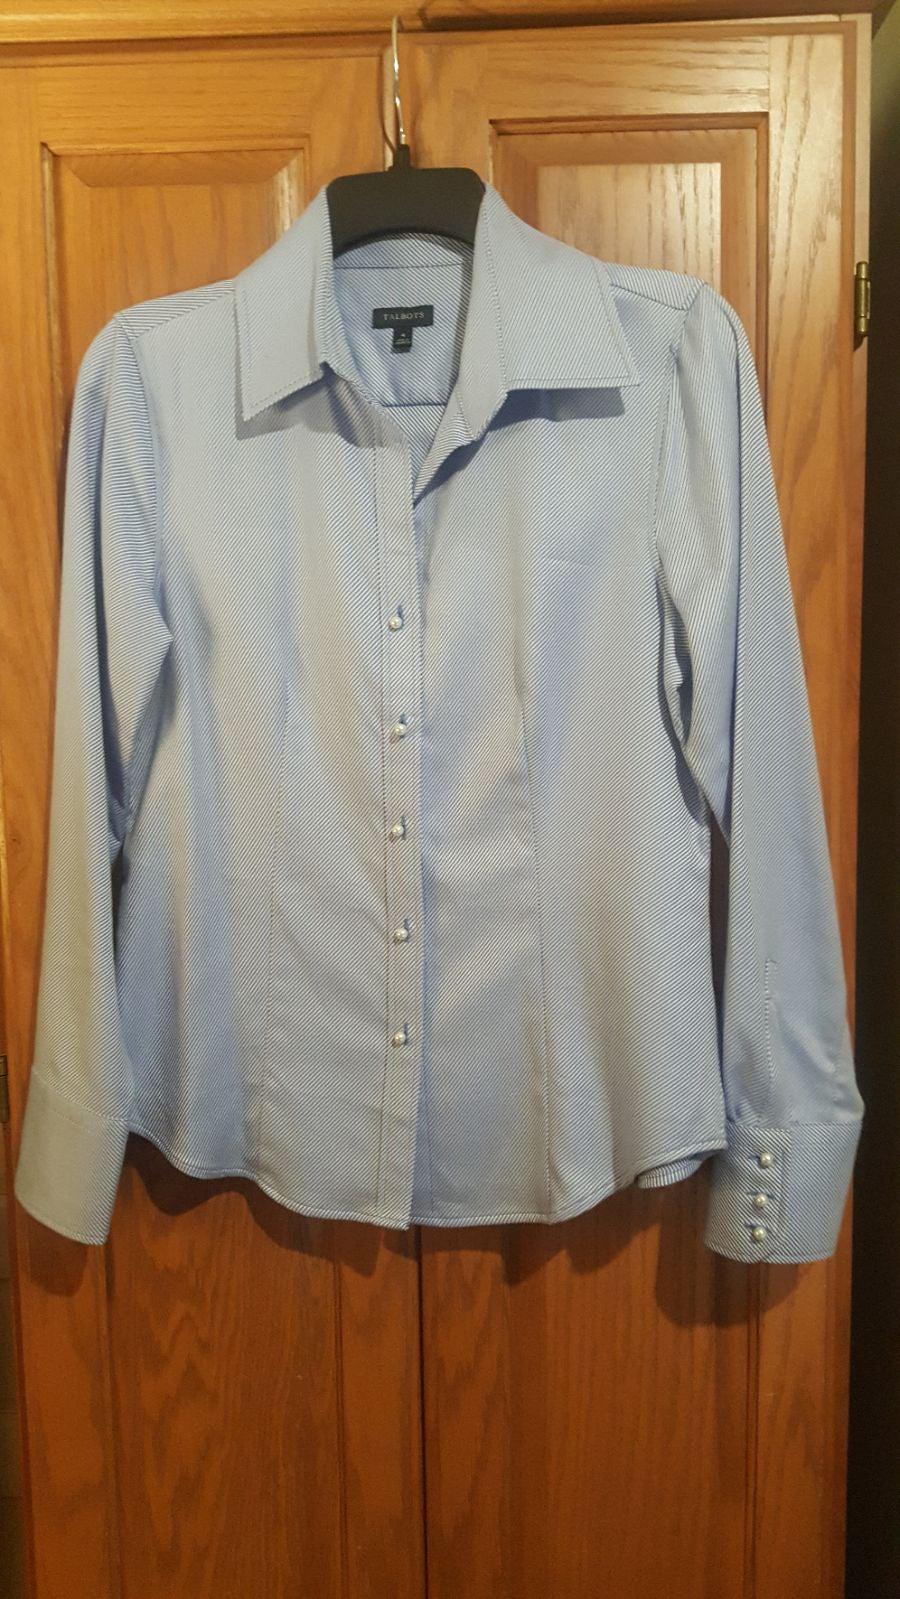 Talbots Women's Blue/White Striped Shirt